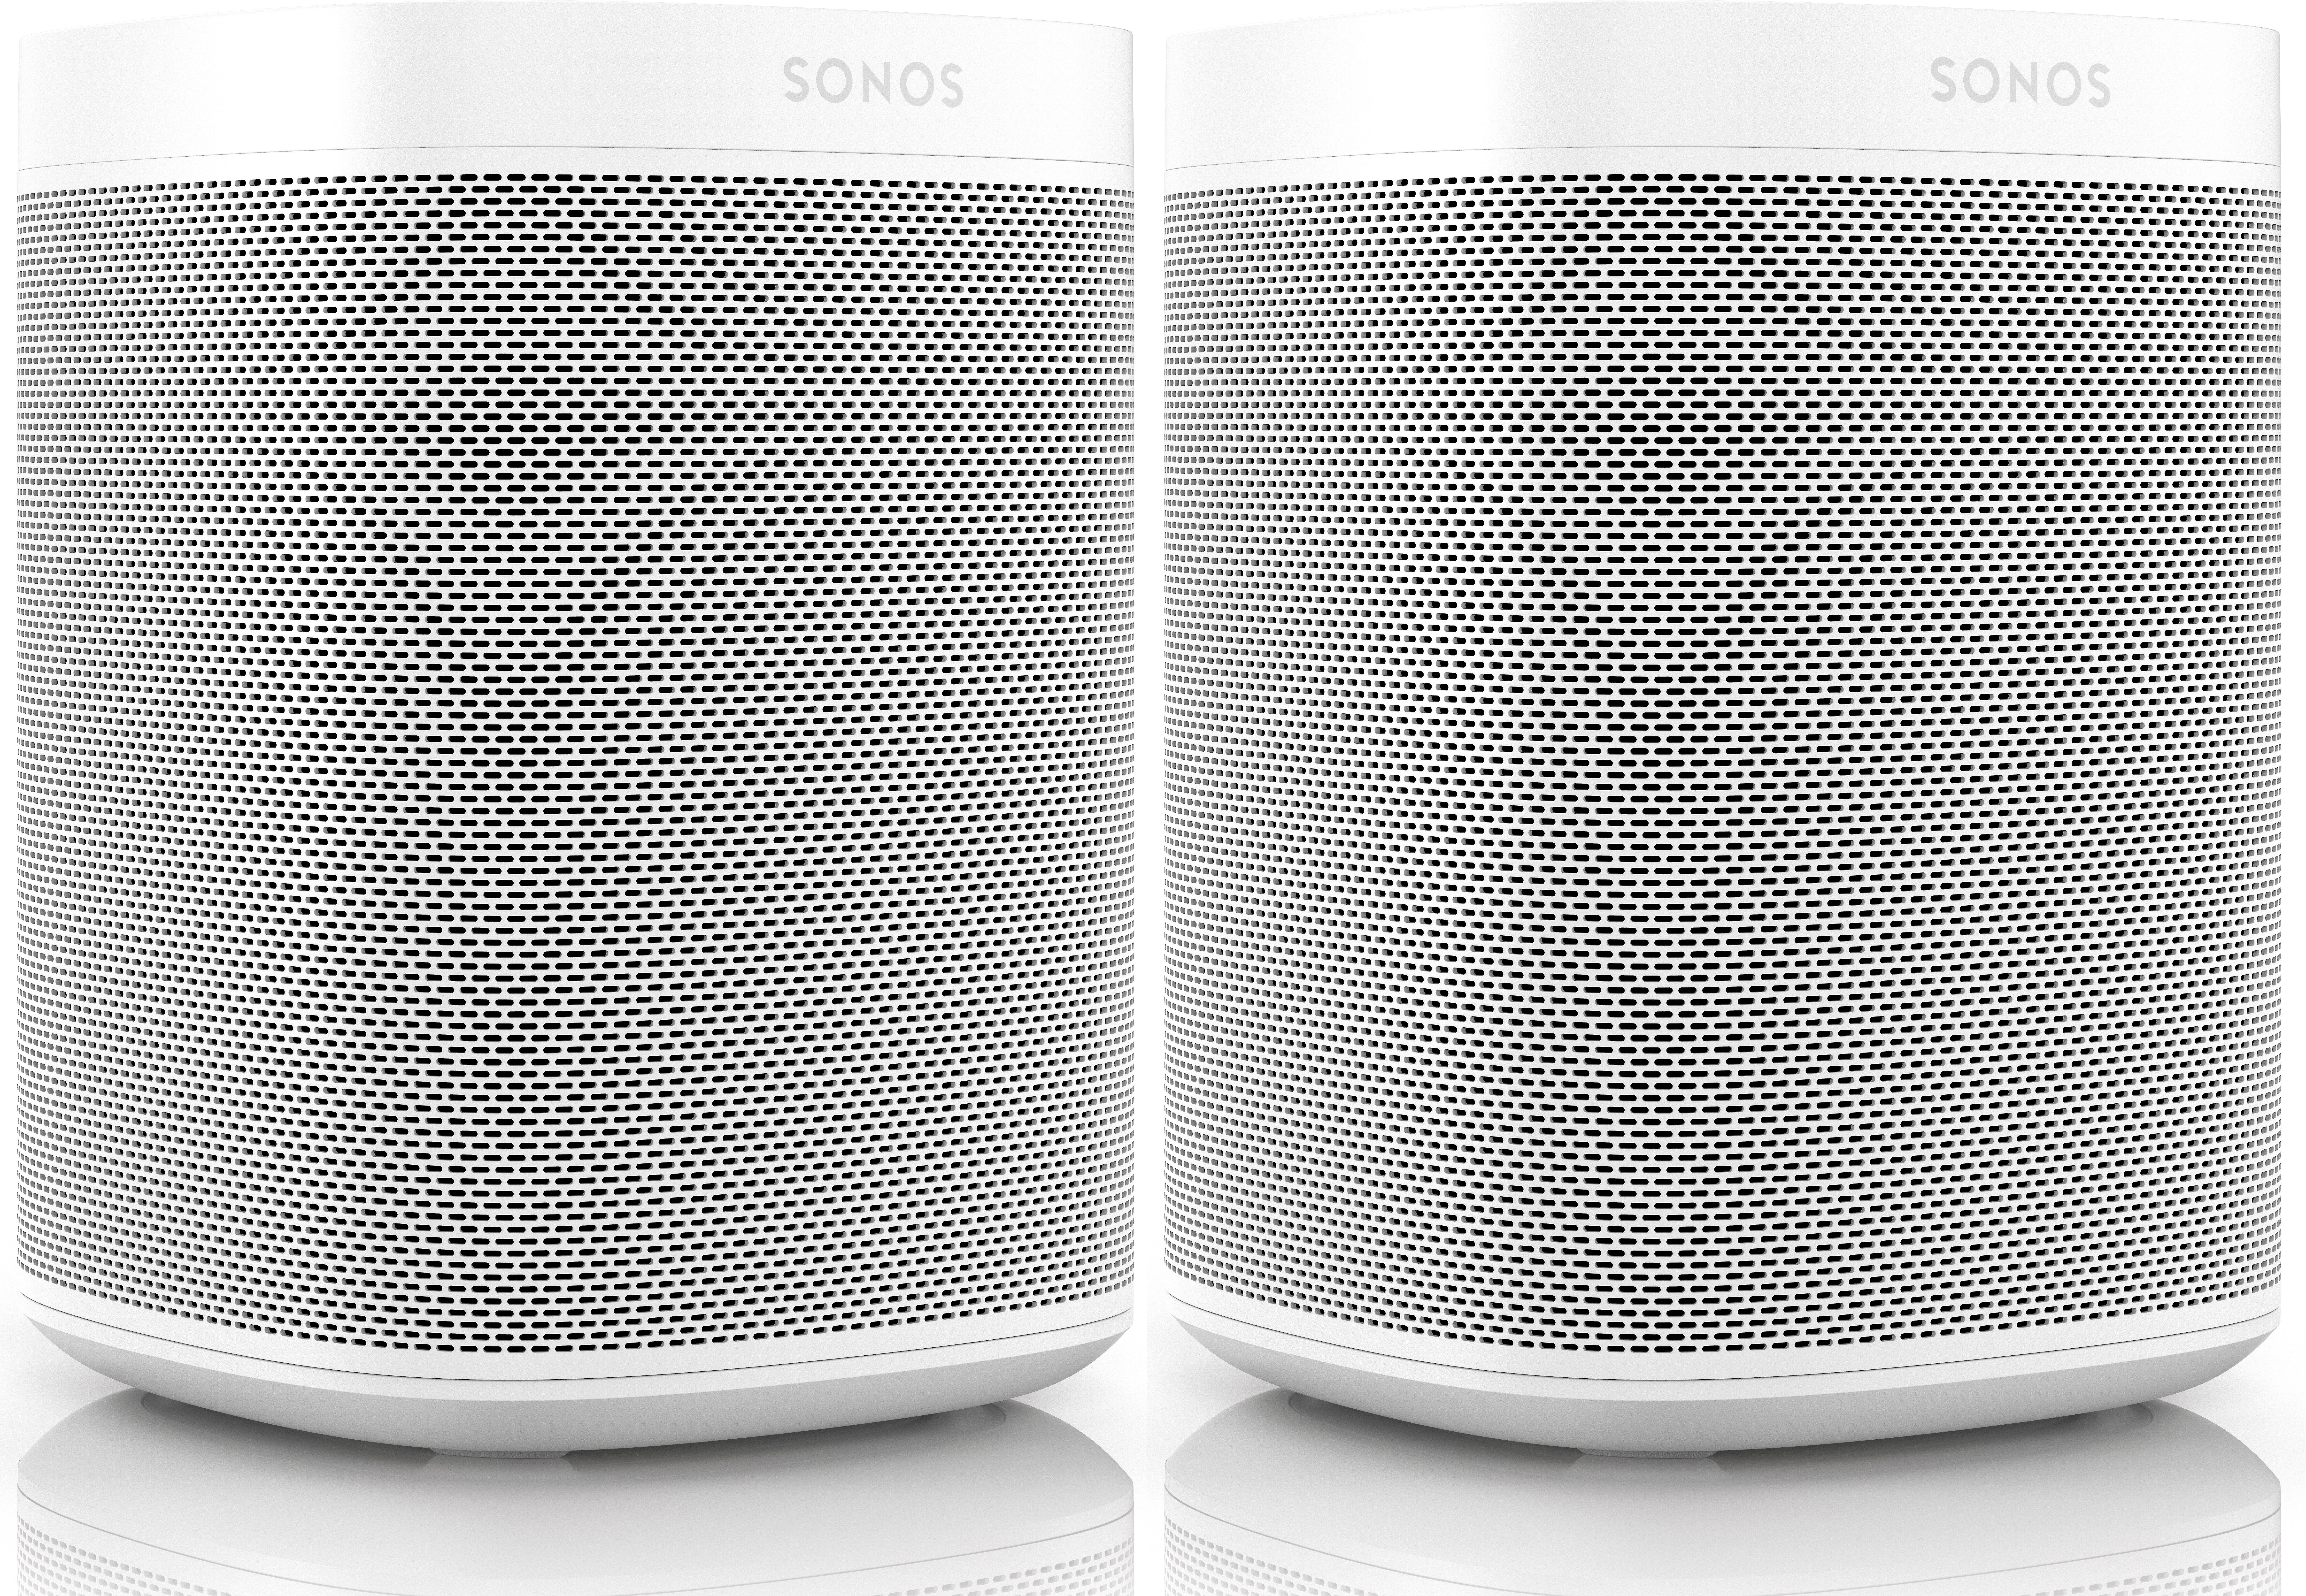 Sonos one vs one sl